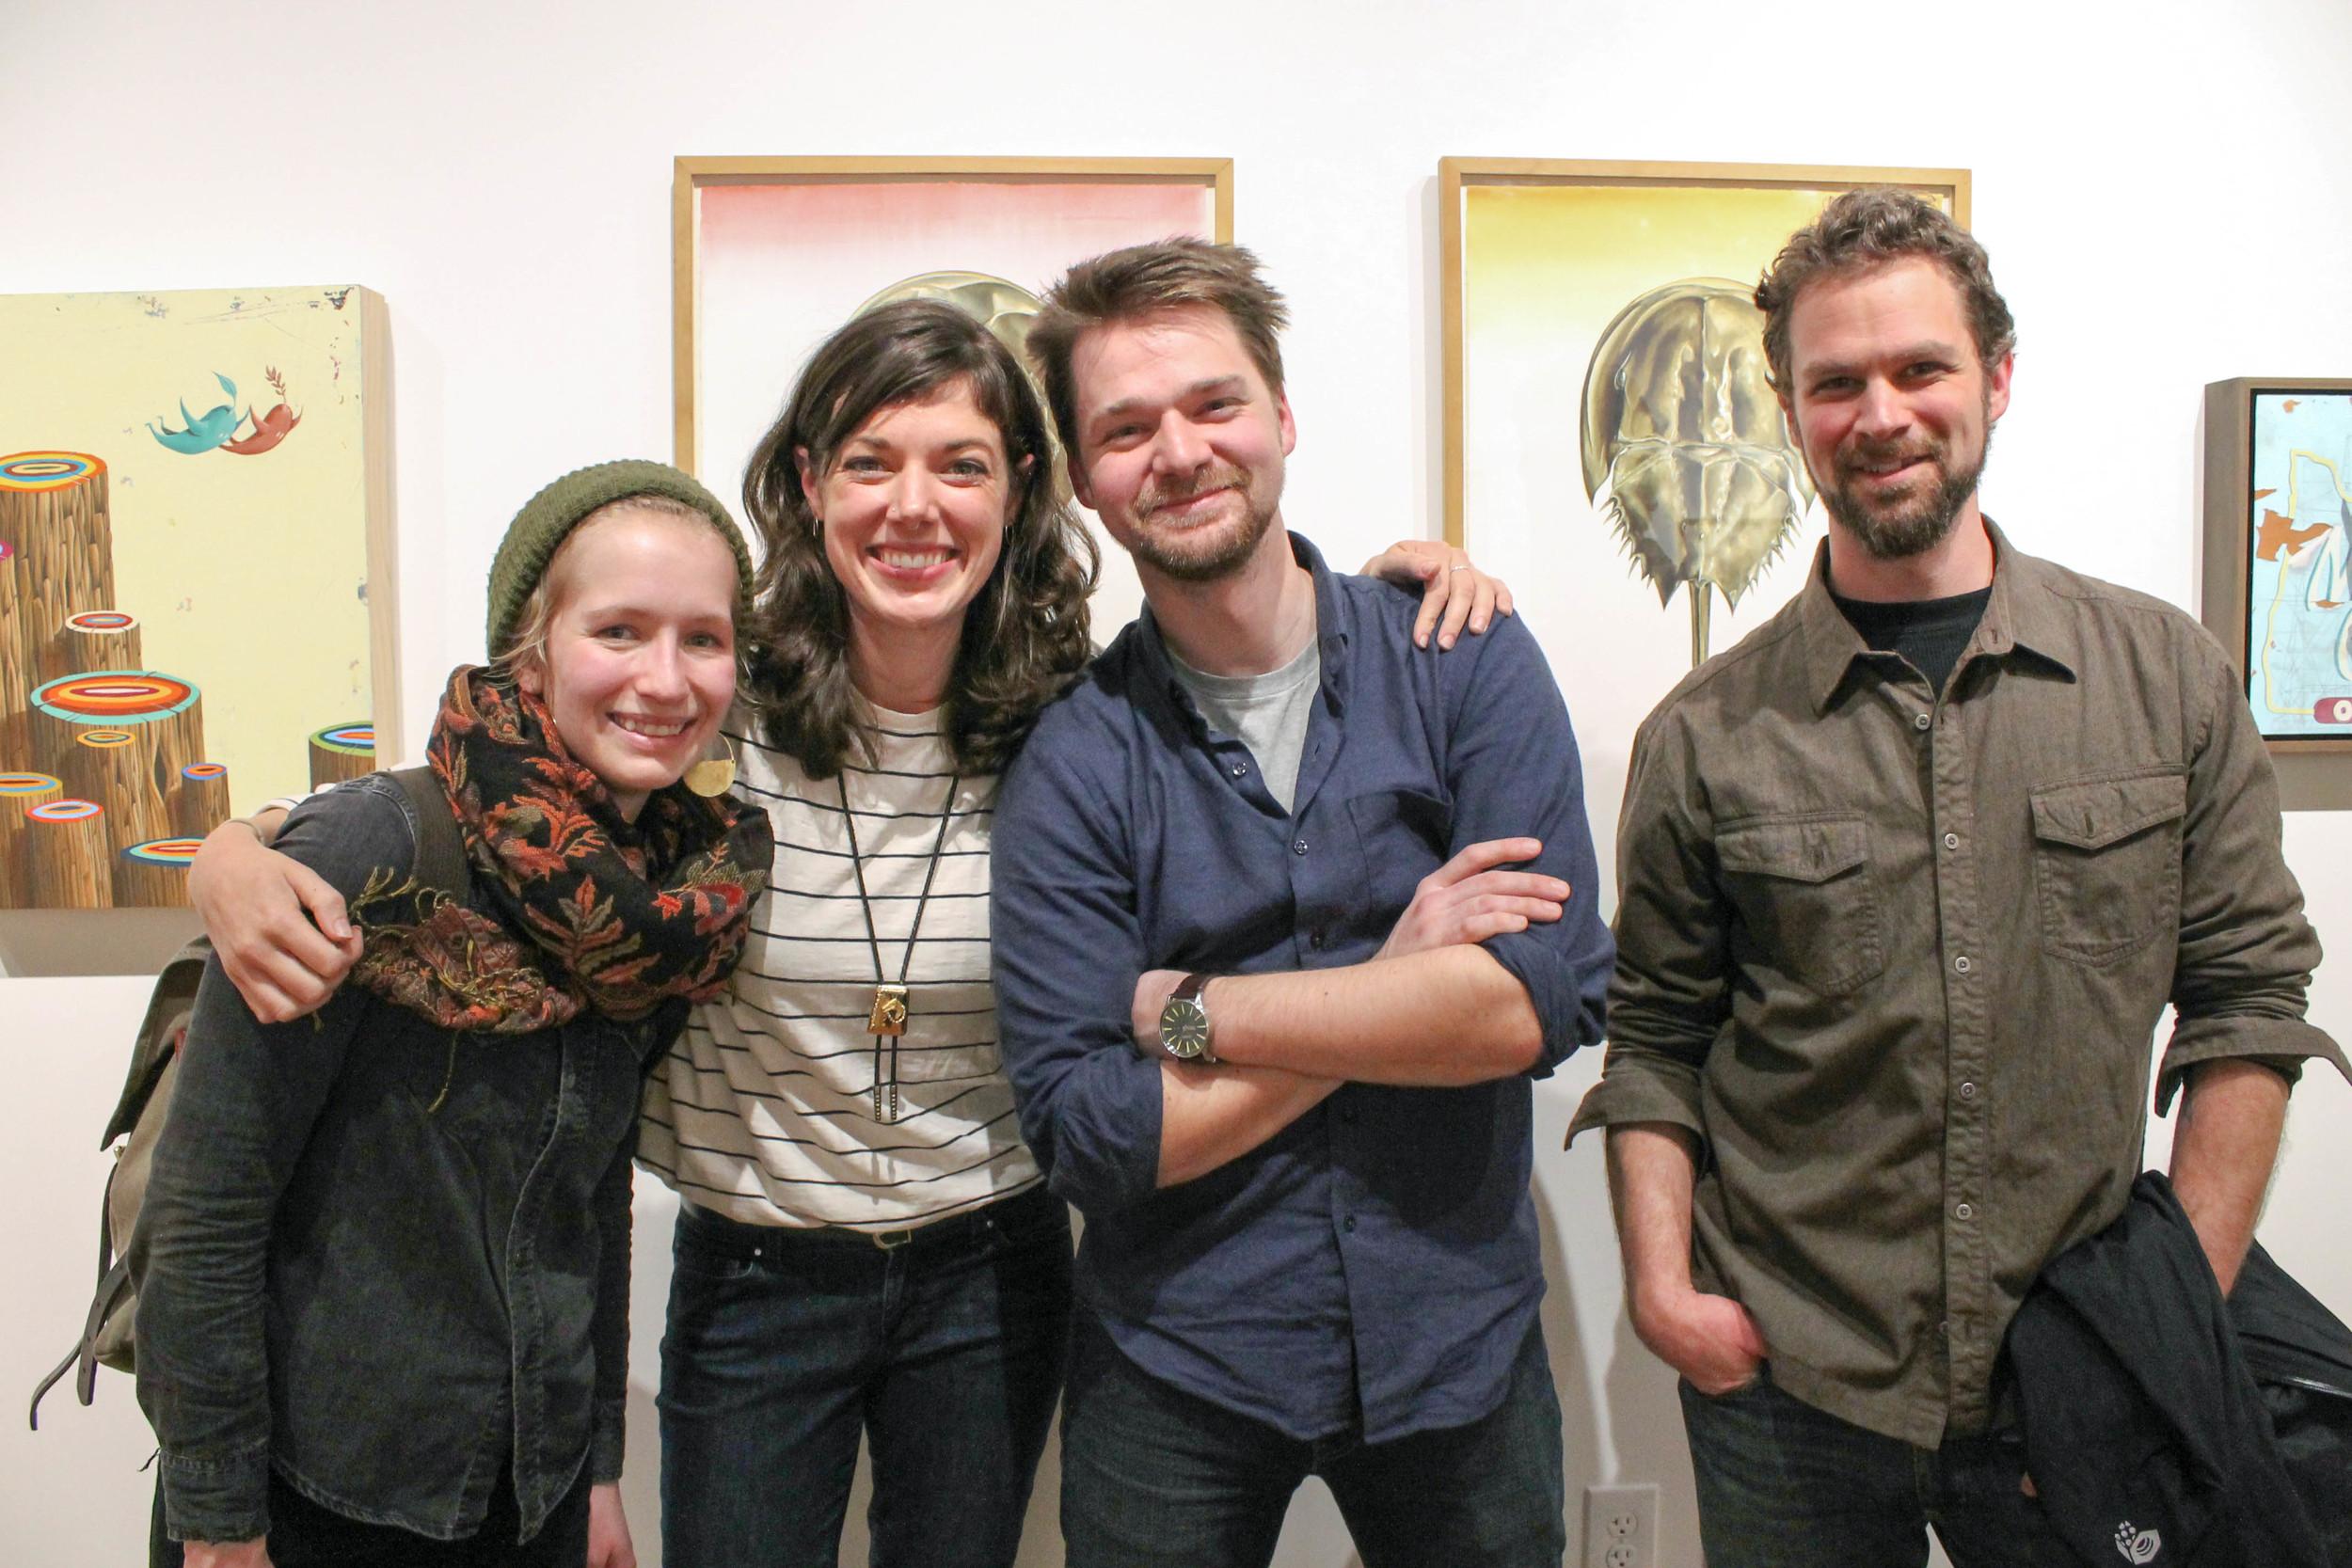 Zoe Keller, Christina Mrozik, Michael Alm, and Brin Levinson